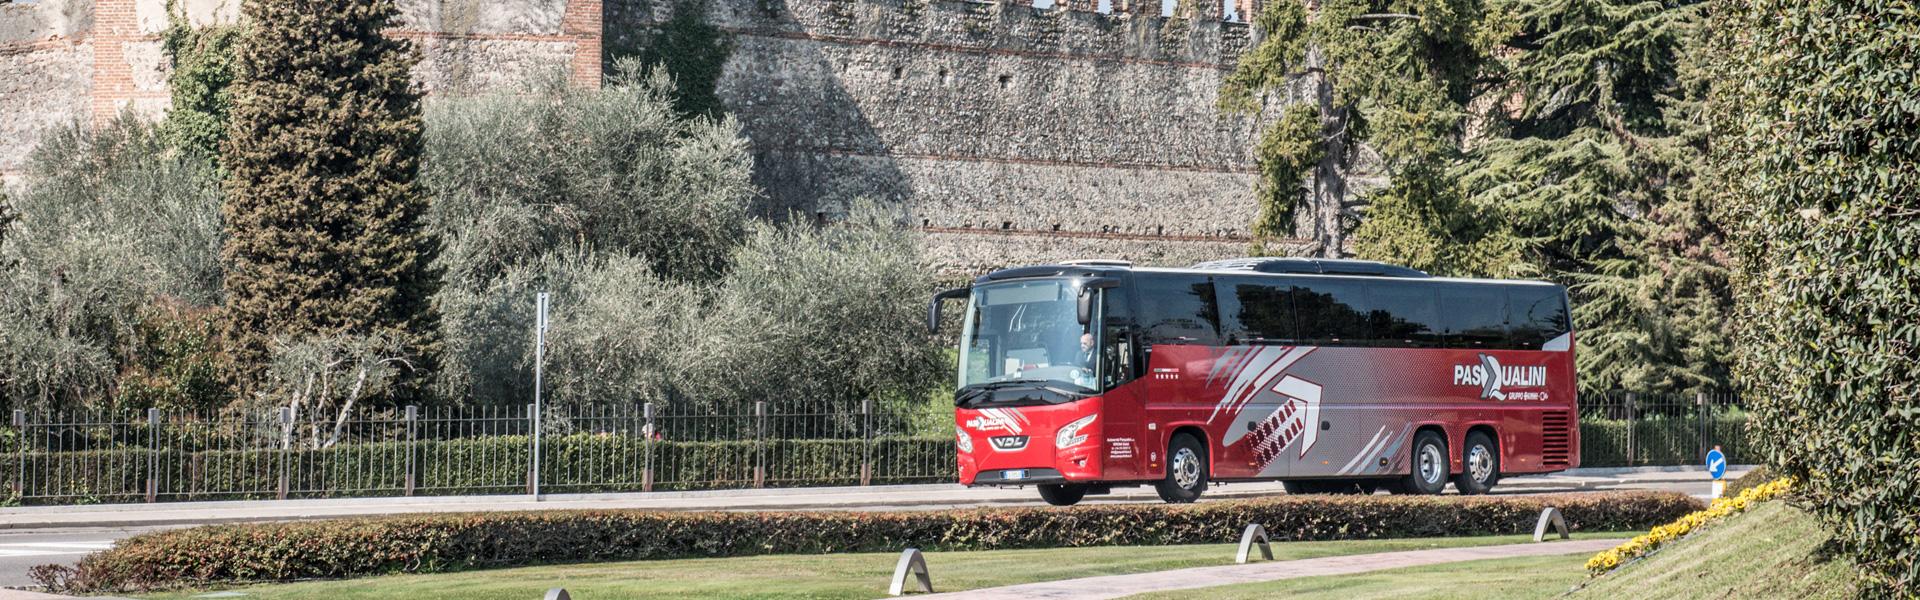 gruppo header- pasqualini bus verona